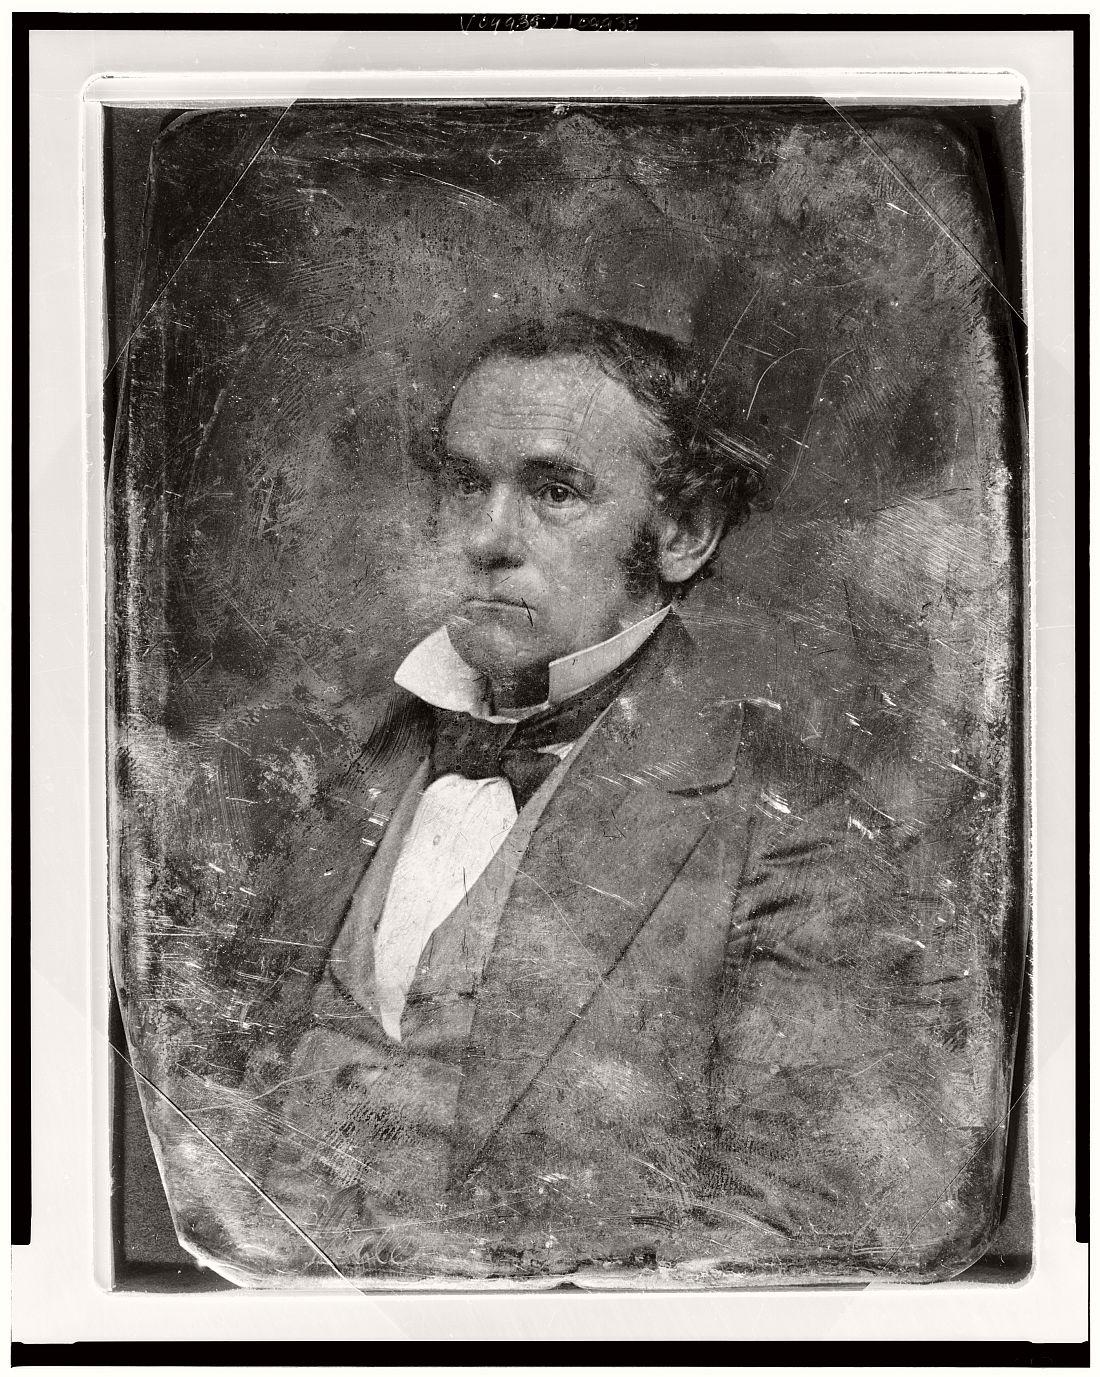 vintage-daguerreotype-portraits-from-xix-century-1844-1860-26